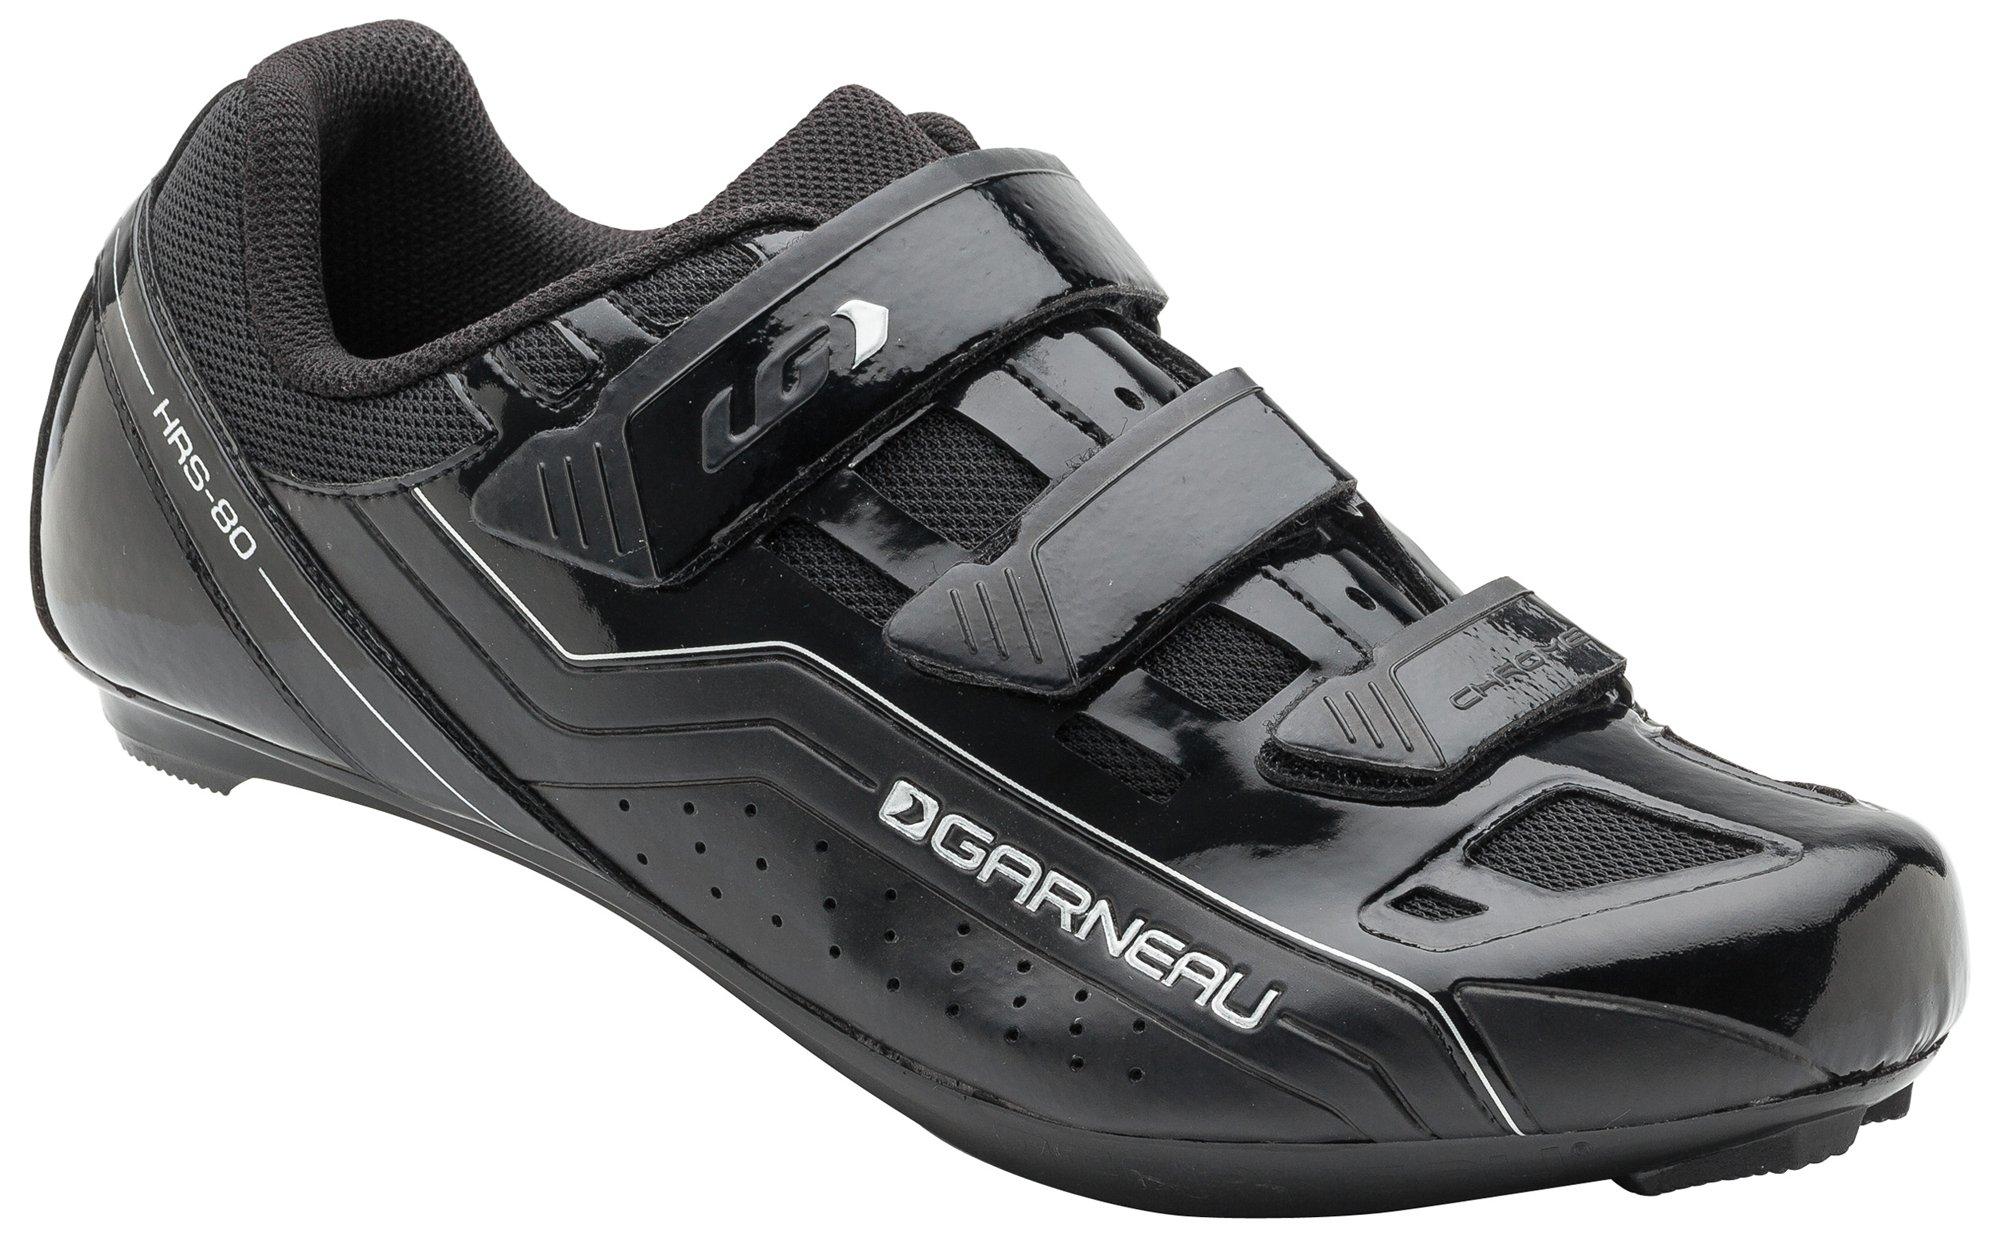 Louis Garneau - Chrome Bike Shoes, Black, US (10.75), EU (45)